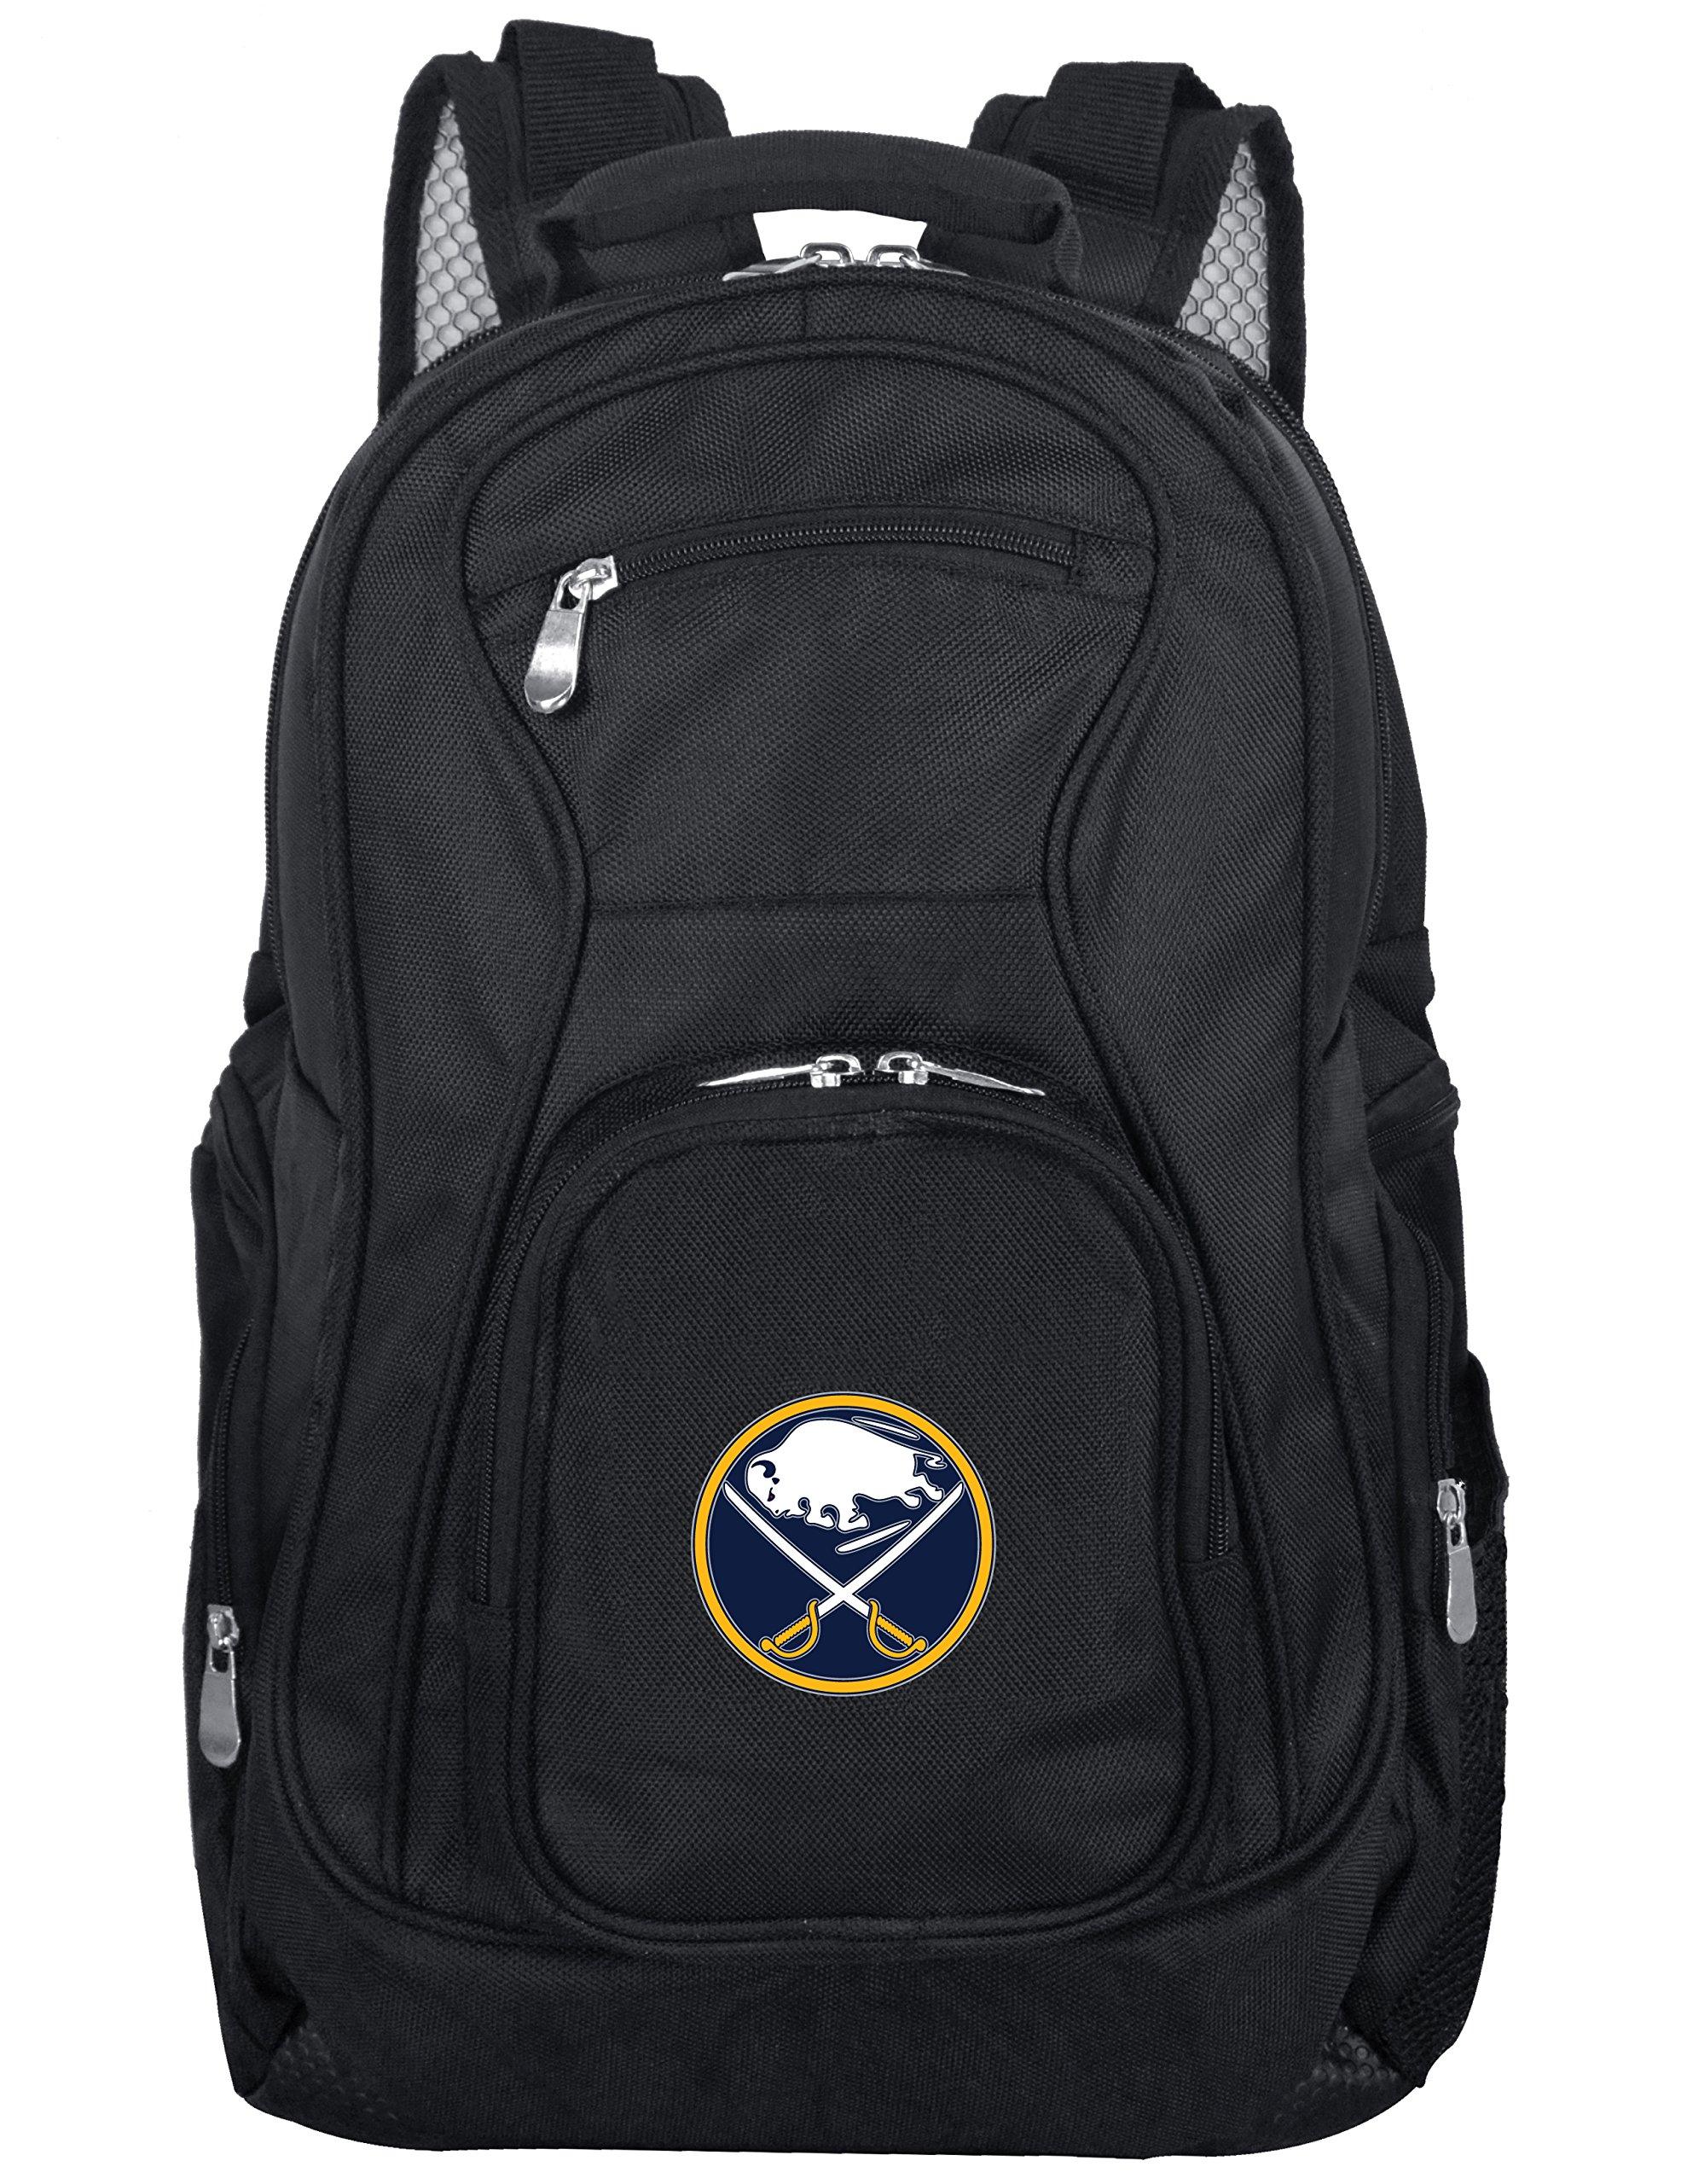 Denco NHL Buffalo Sabres Voyager Laptop Backpack, 19-inches, Black